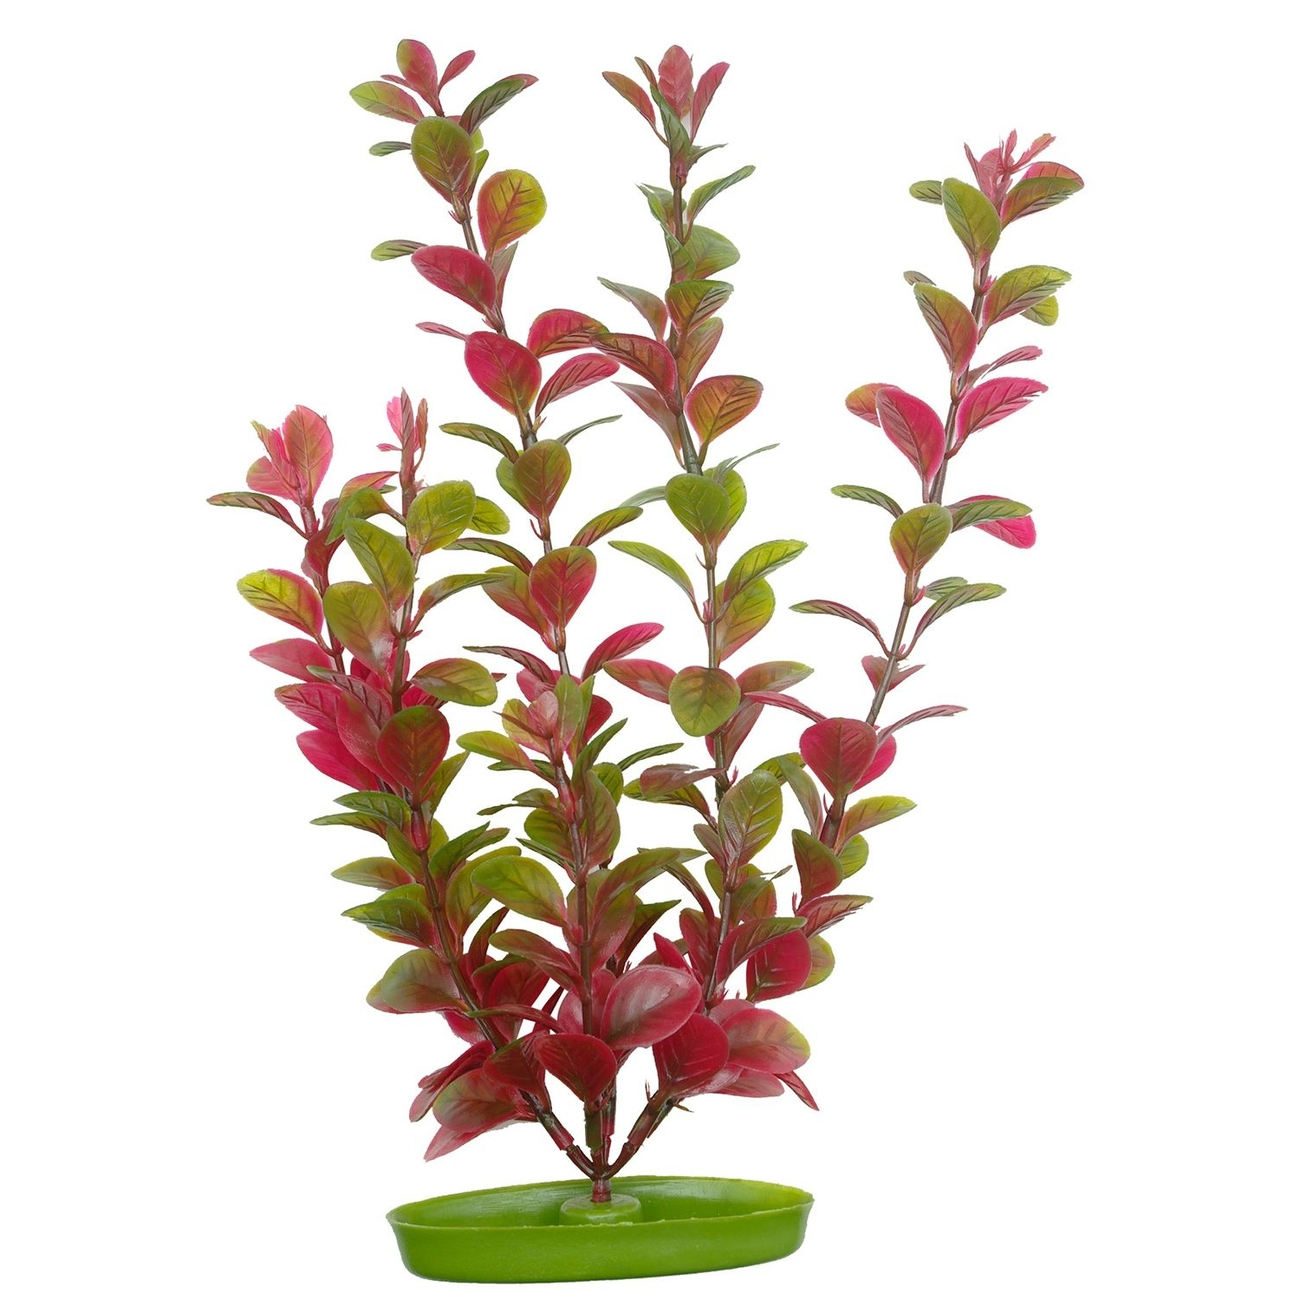 Hagen Marina Aquascaper Pflanzen bis 20 cm, Red Ludwigia - 7,5 x 3,7 x 16,0 cm